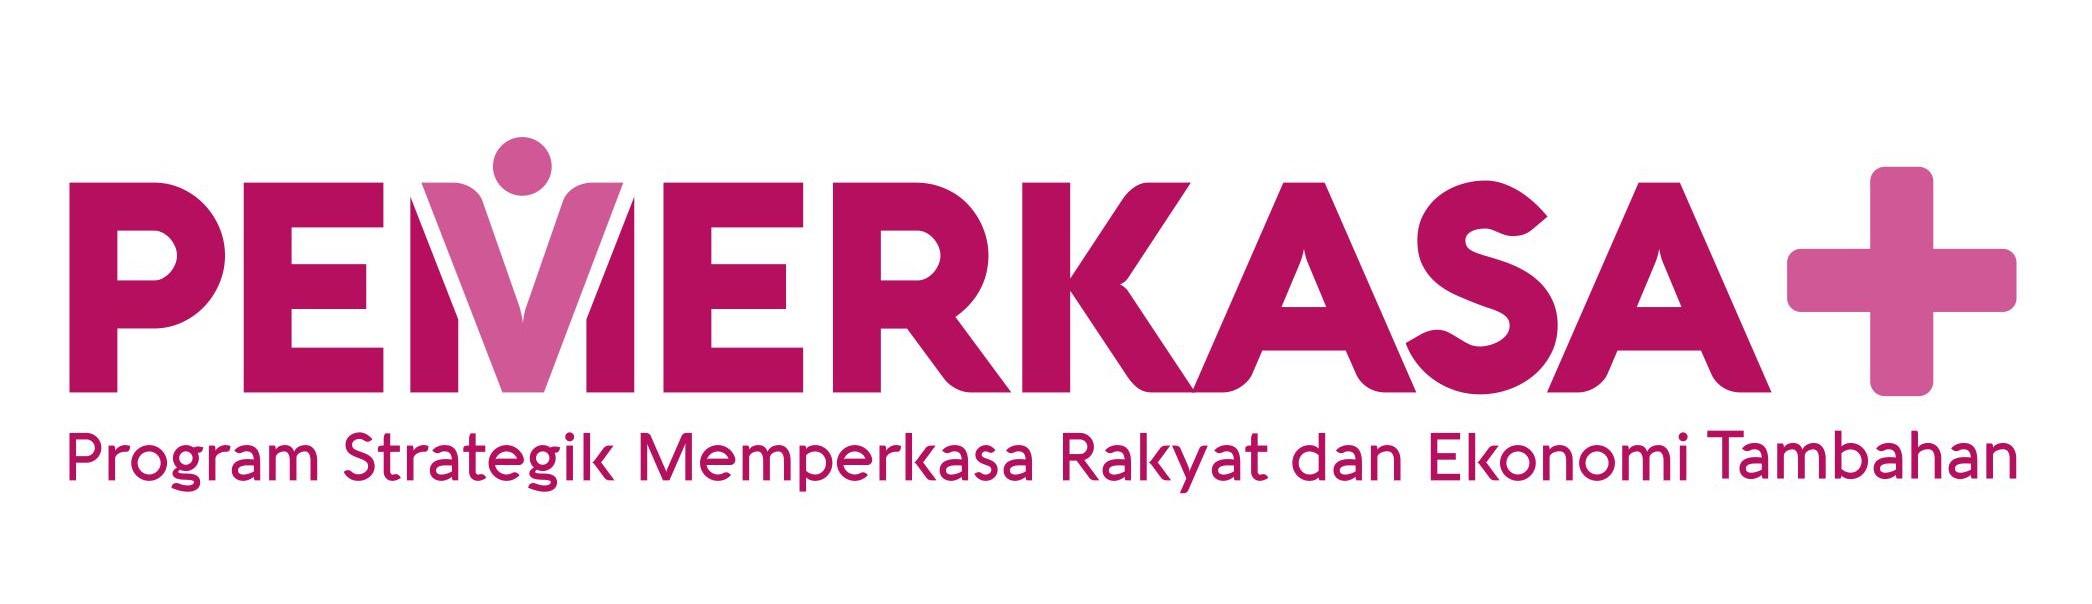 PEMERKASA Plus to Aid the People